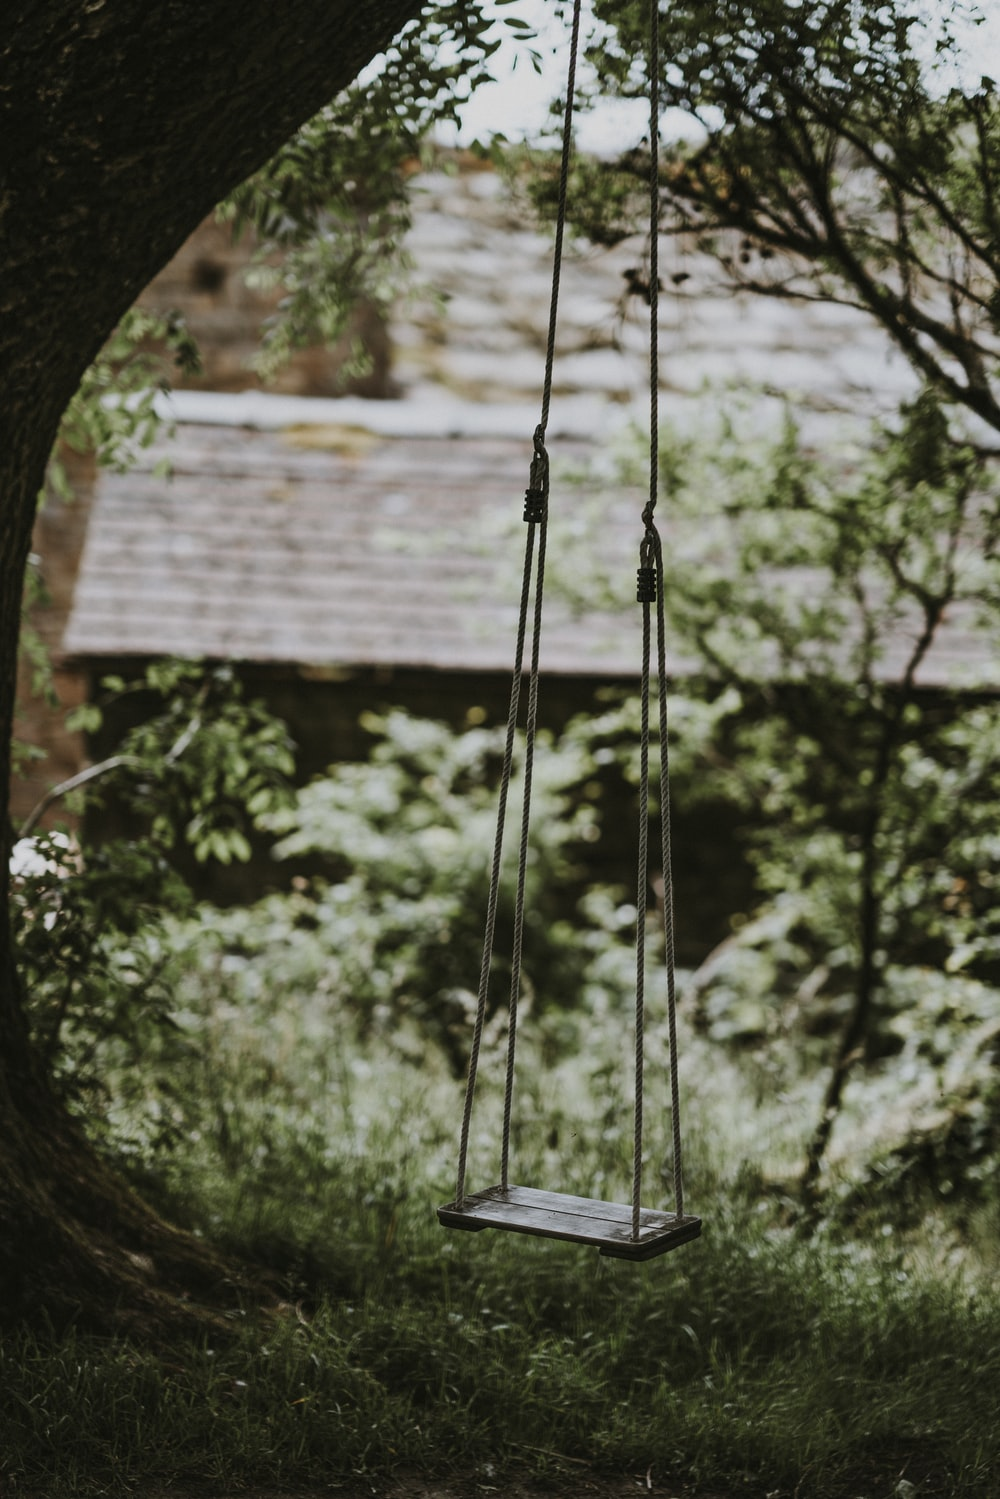 swing hanged on tree